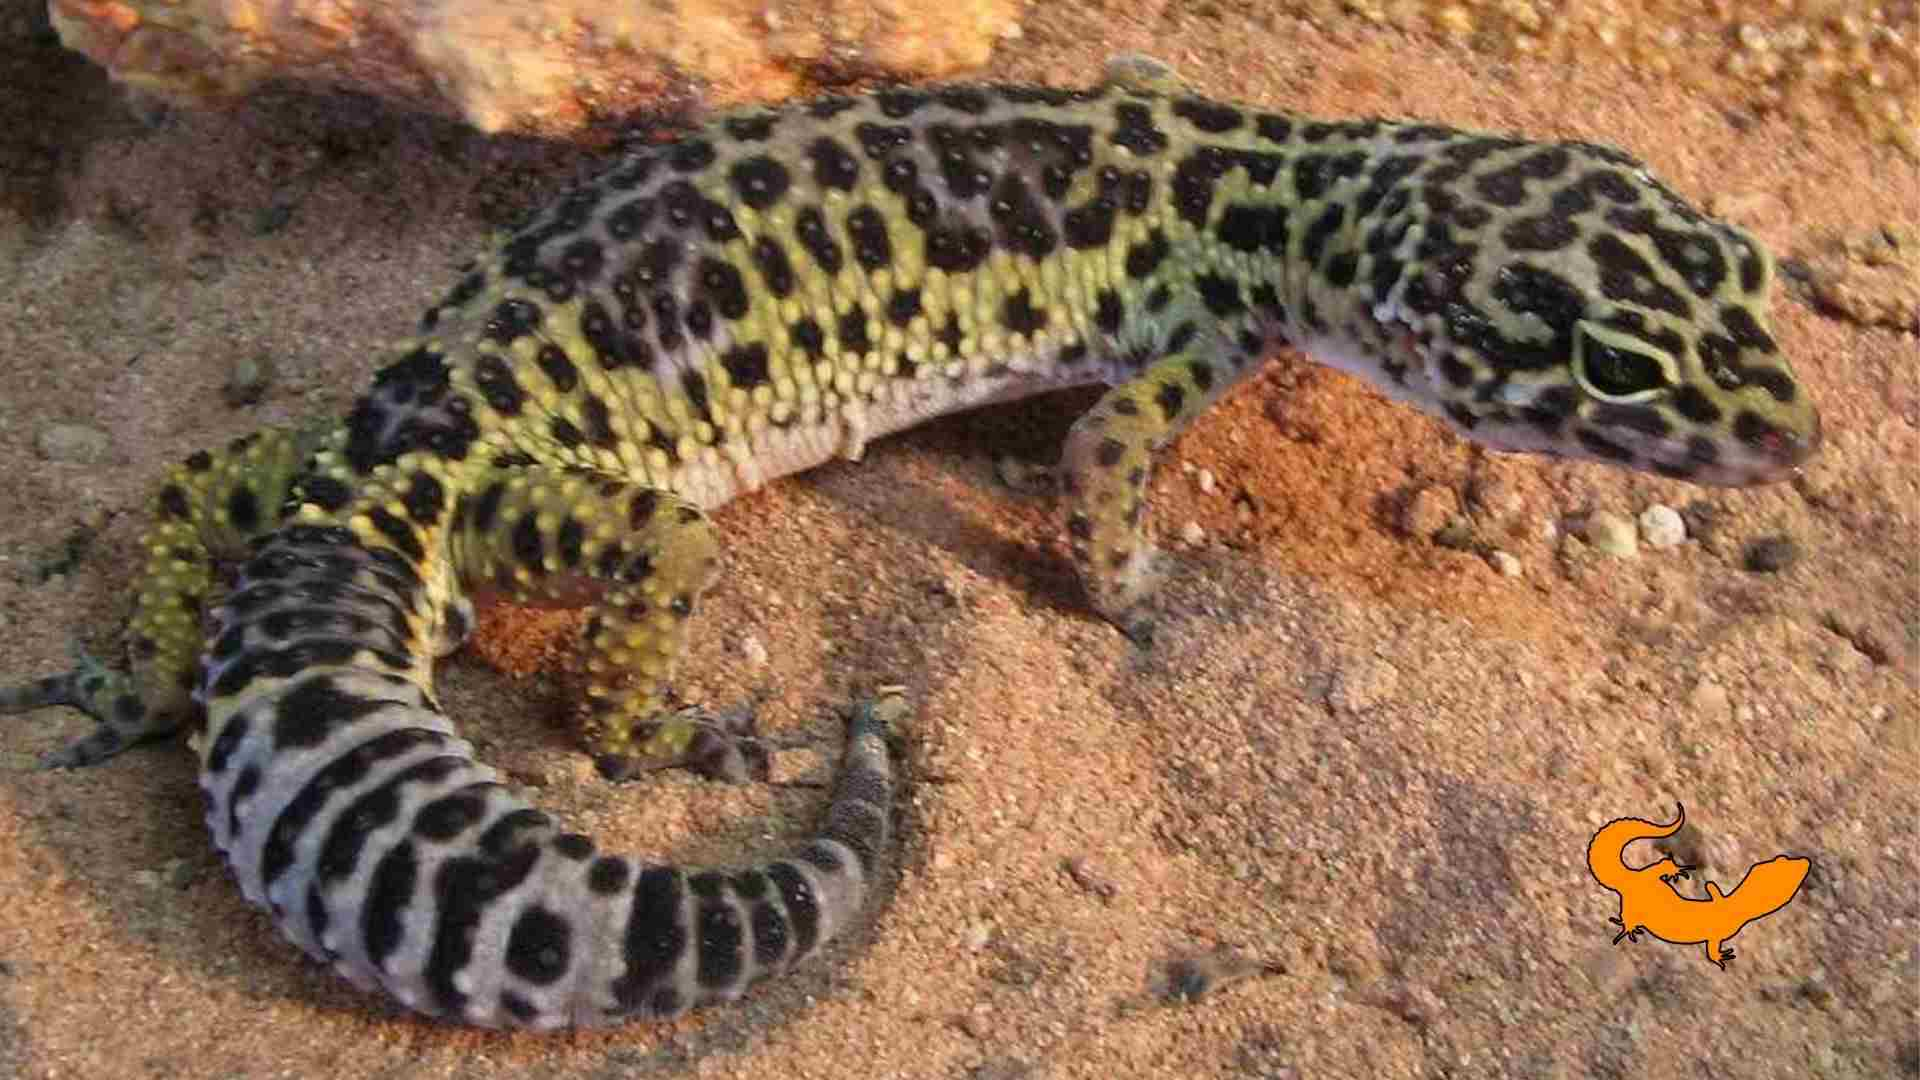 Leggende sul geco leopardino